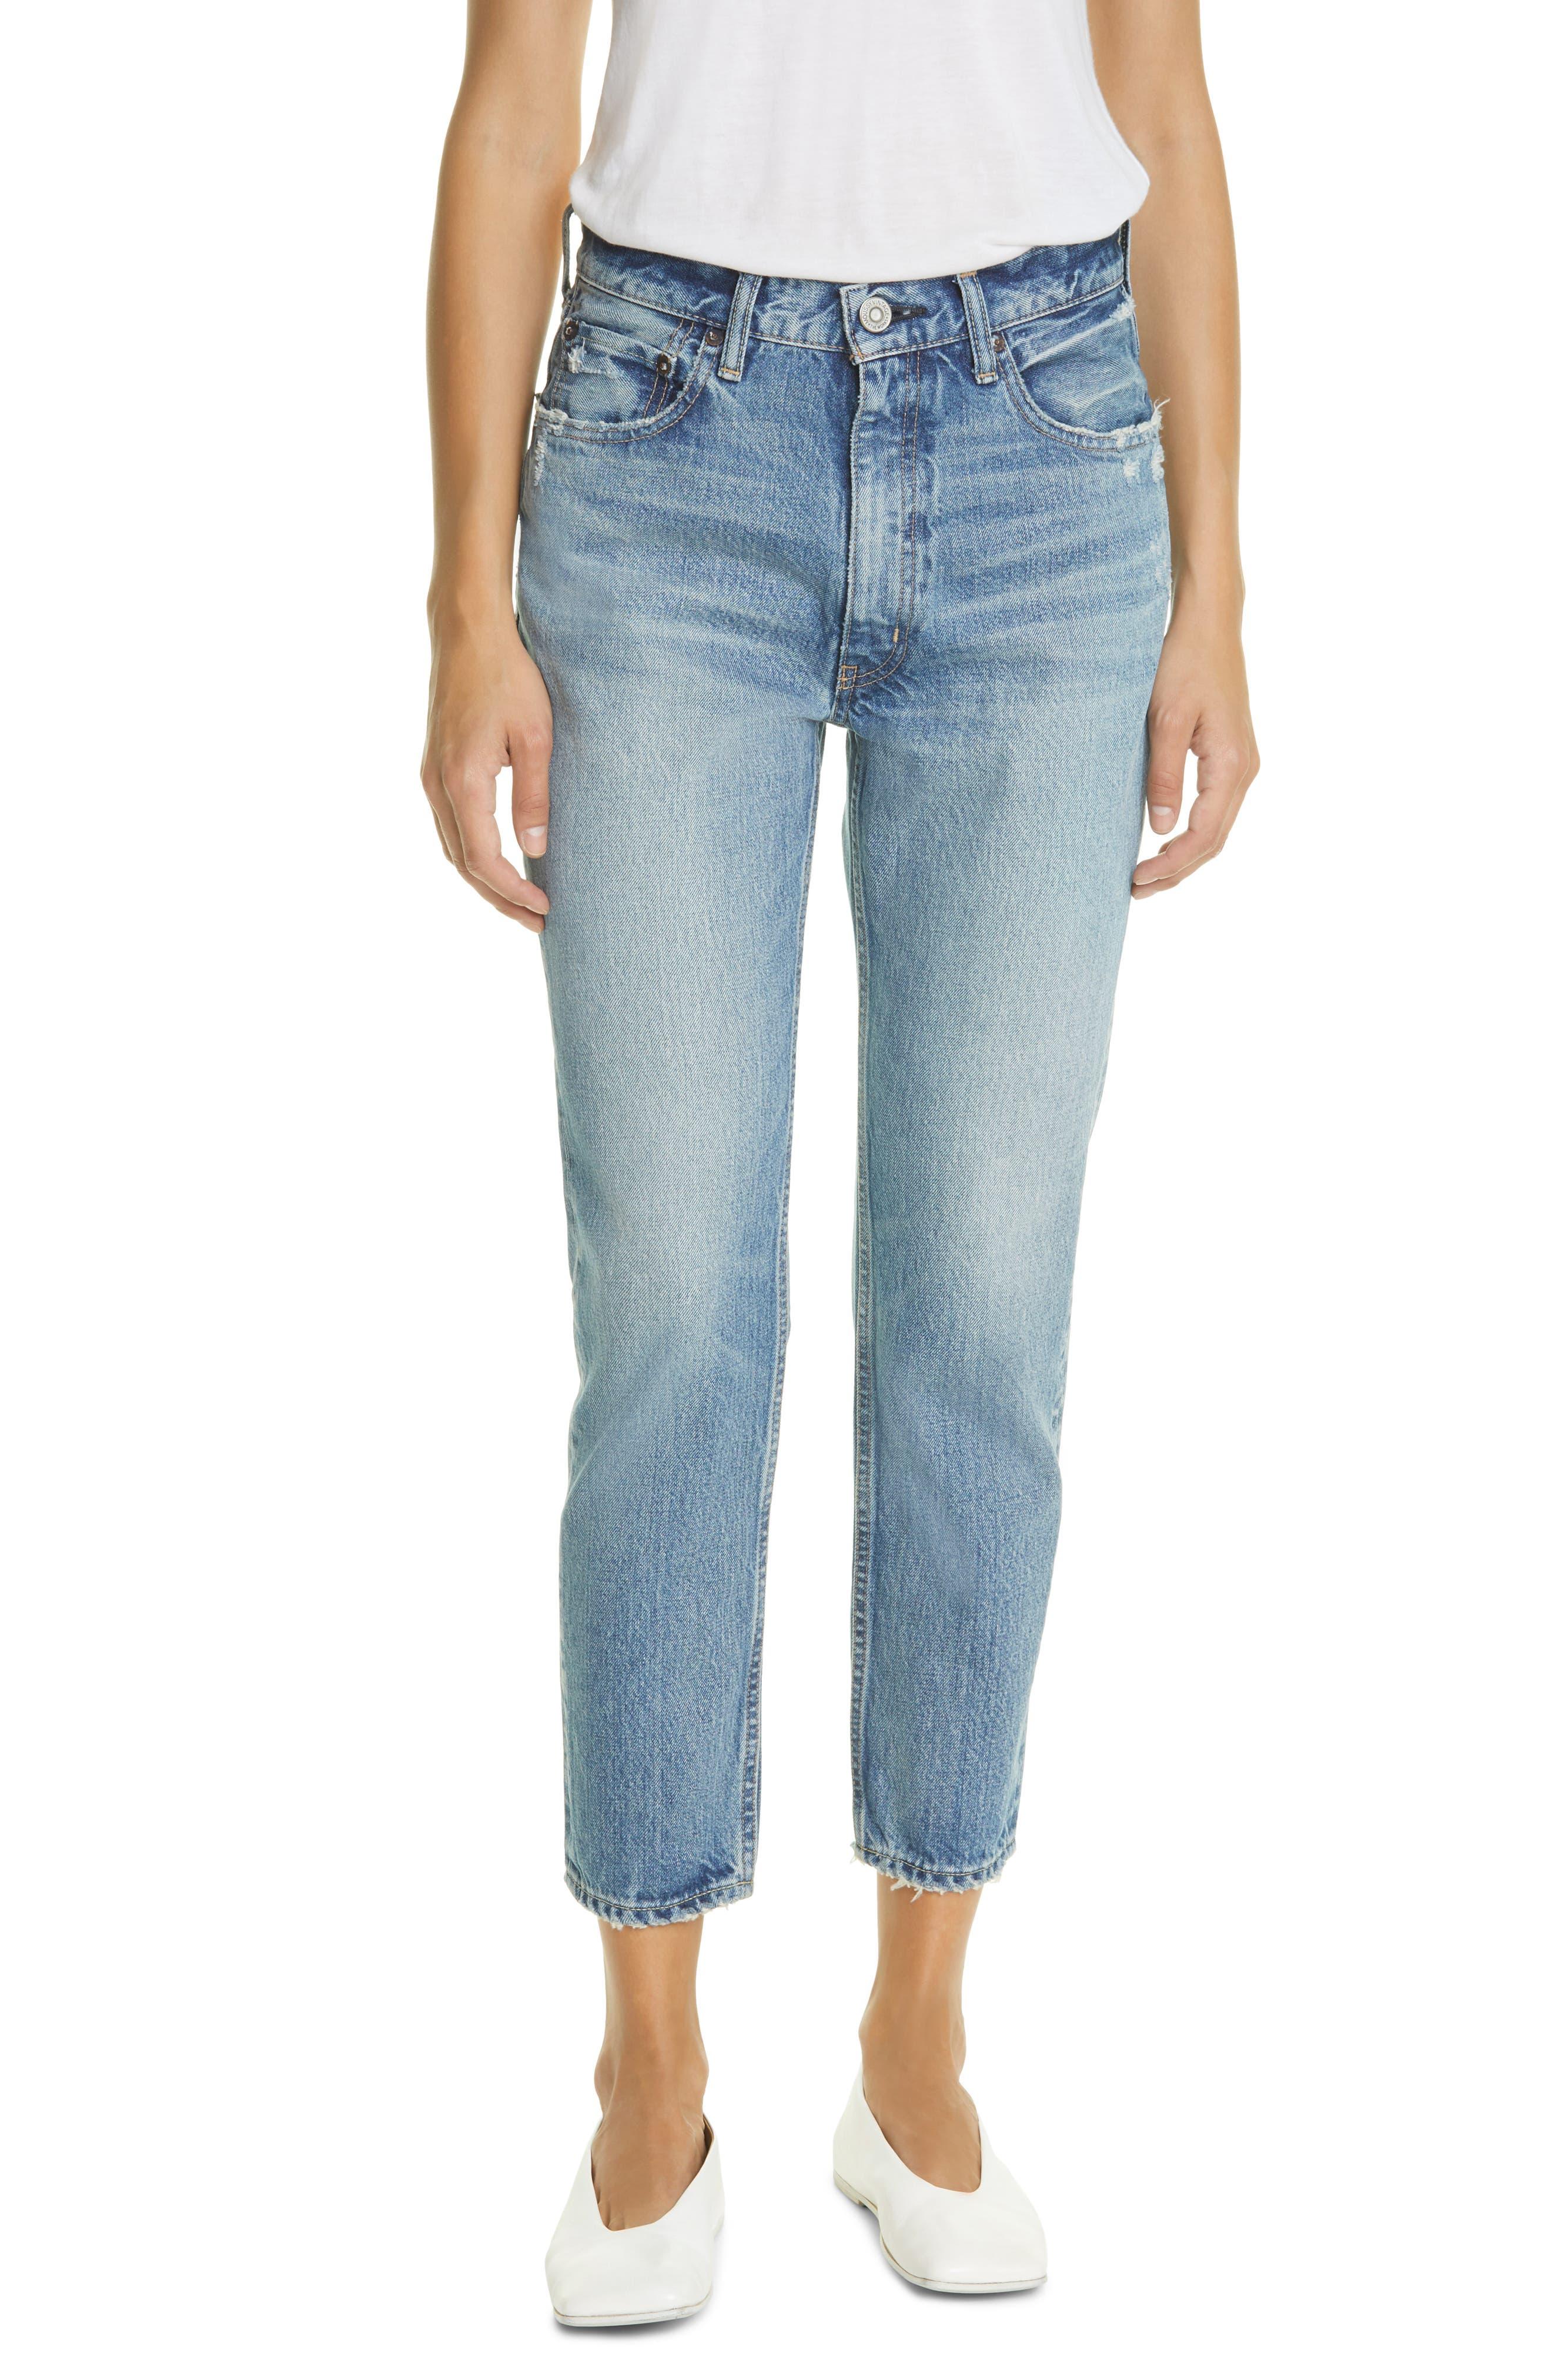 Dells Boyfriend Skinny Jeans